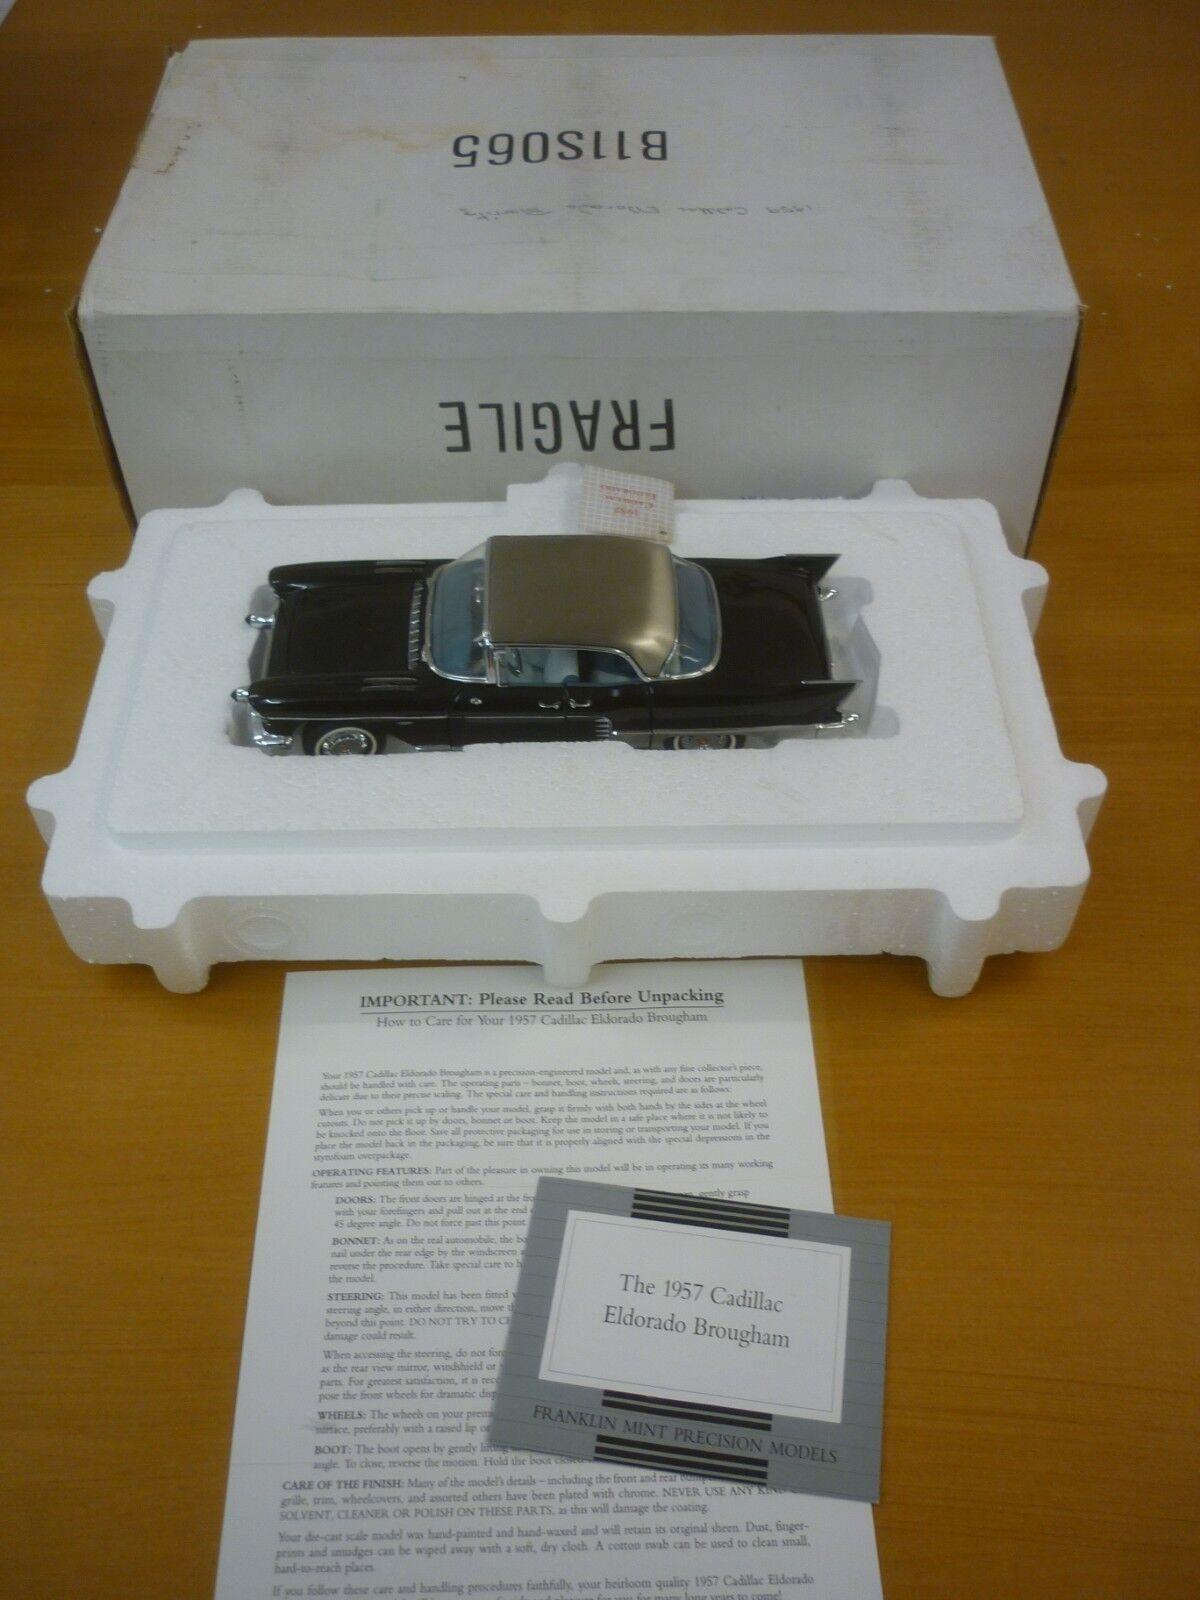 primera vez respuesta Un modelo modelo modelo de escala Franklin Mint de un 1957 Cadillac Eldorado Brougham, papeles, en Caja  ventas en linea